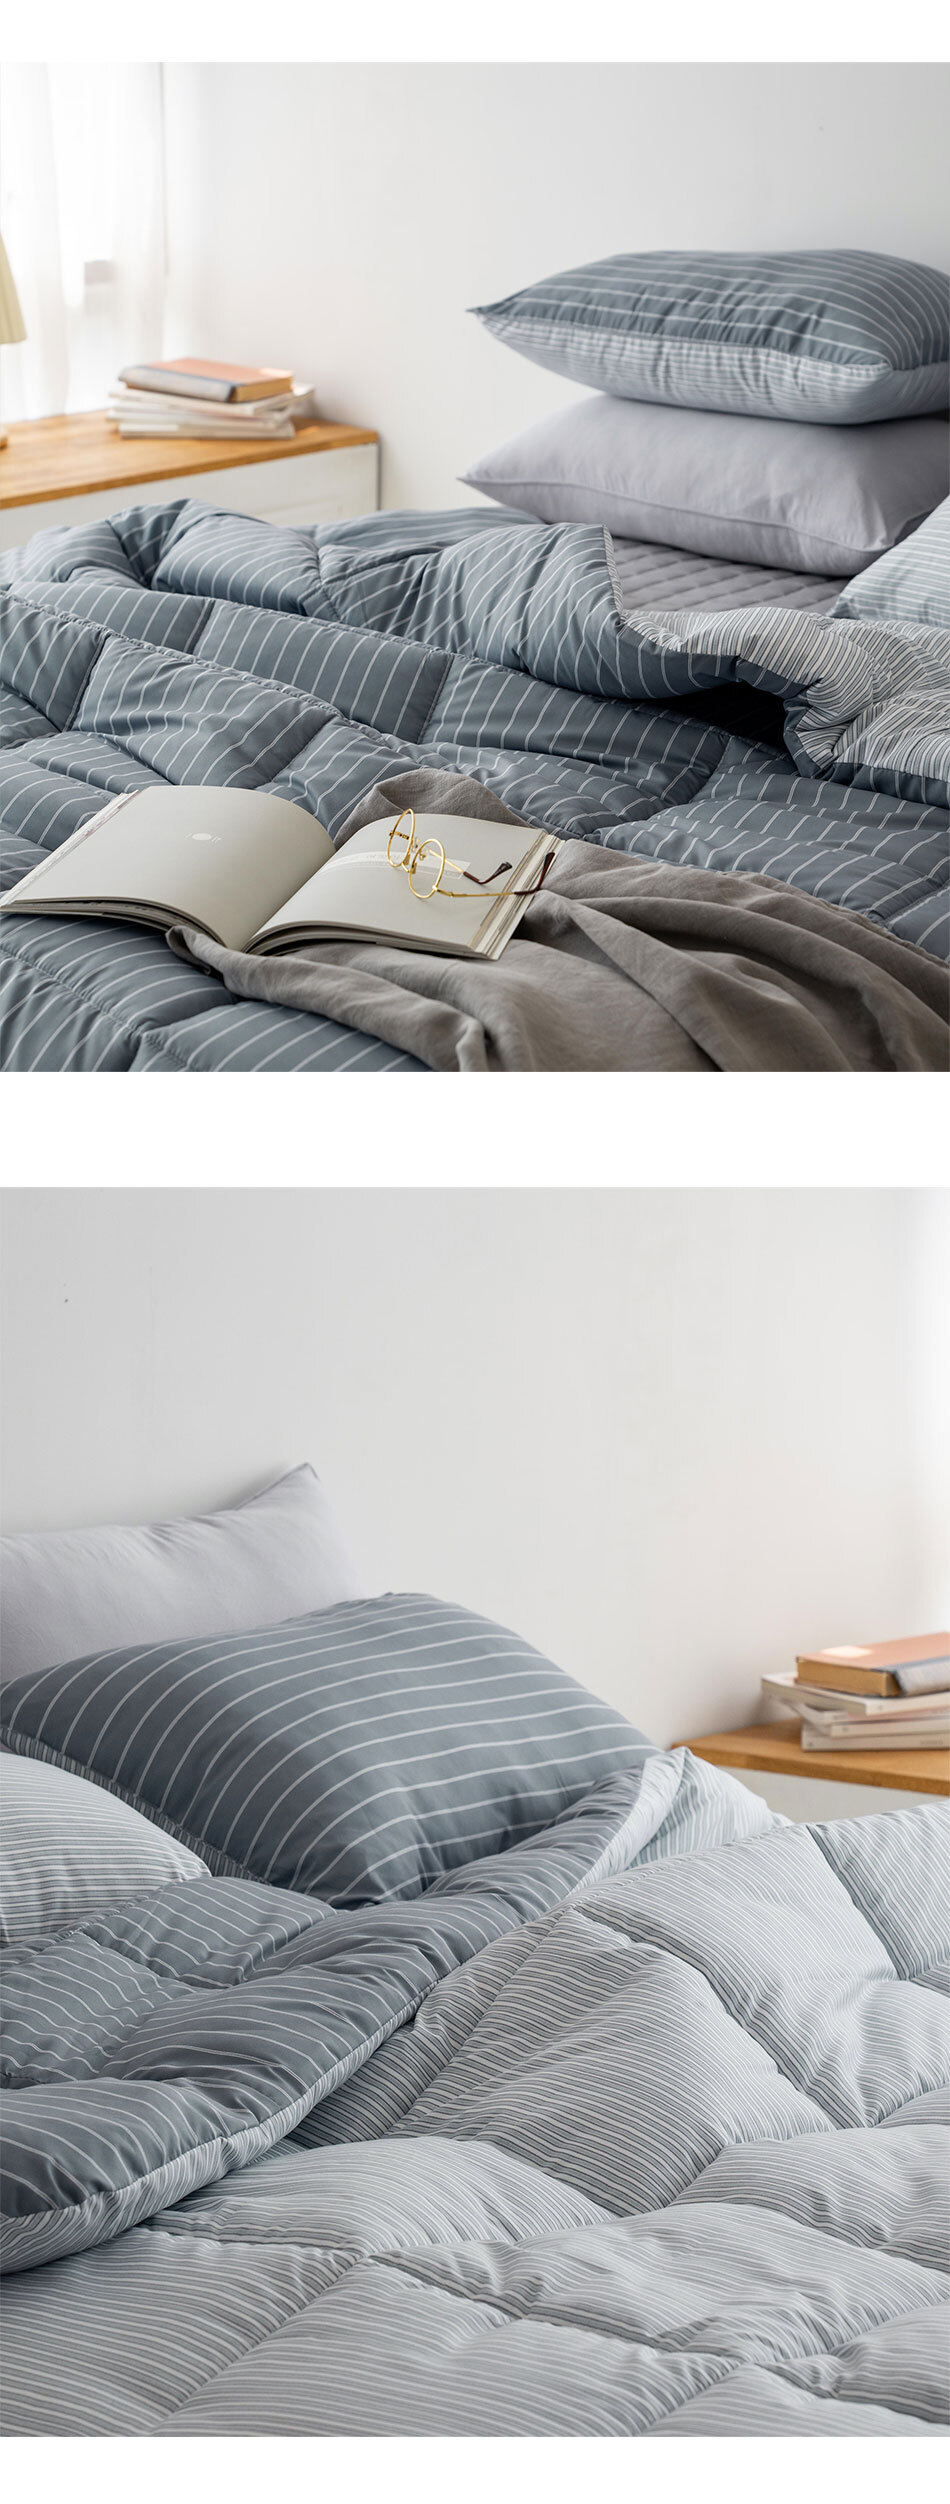 urban_bed_gray_02.jpg